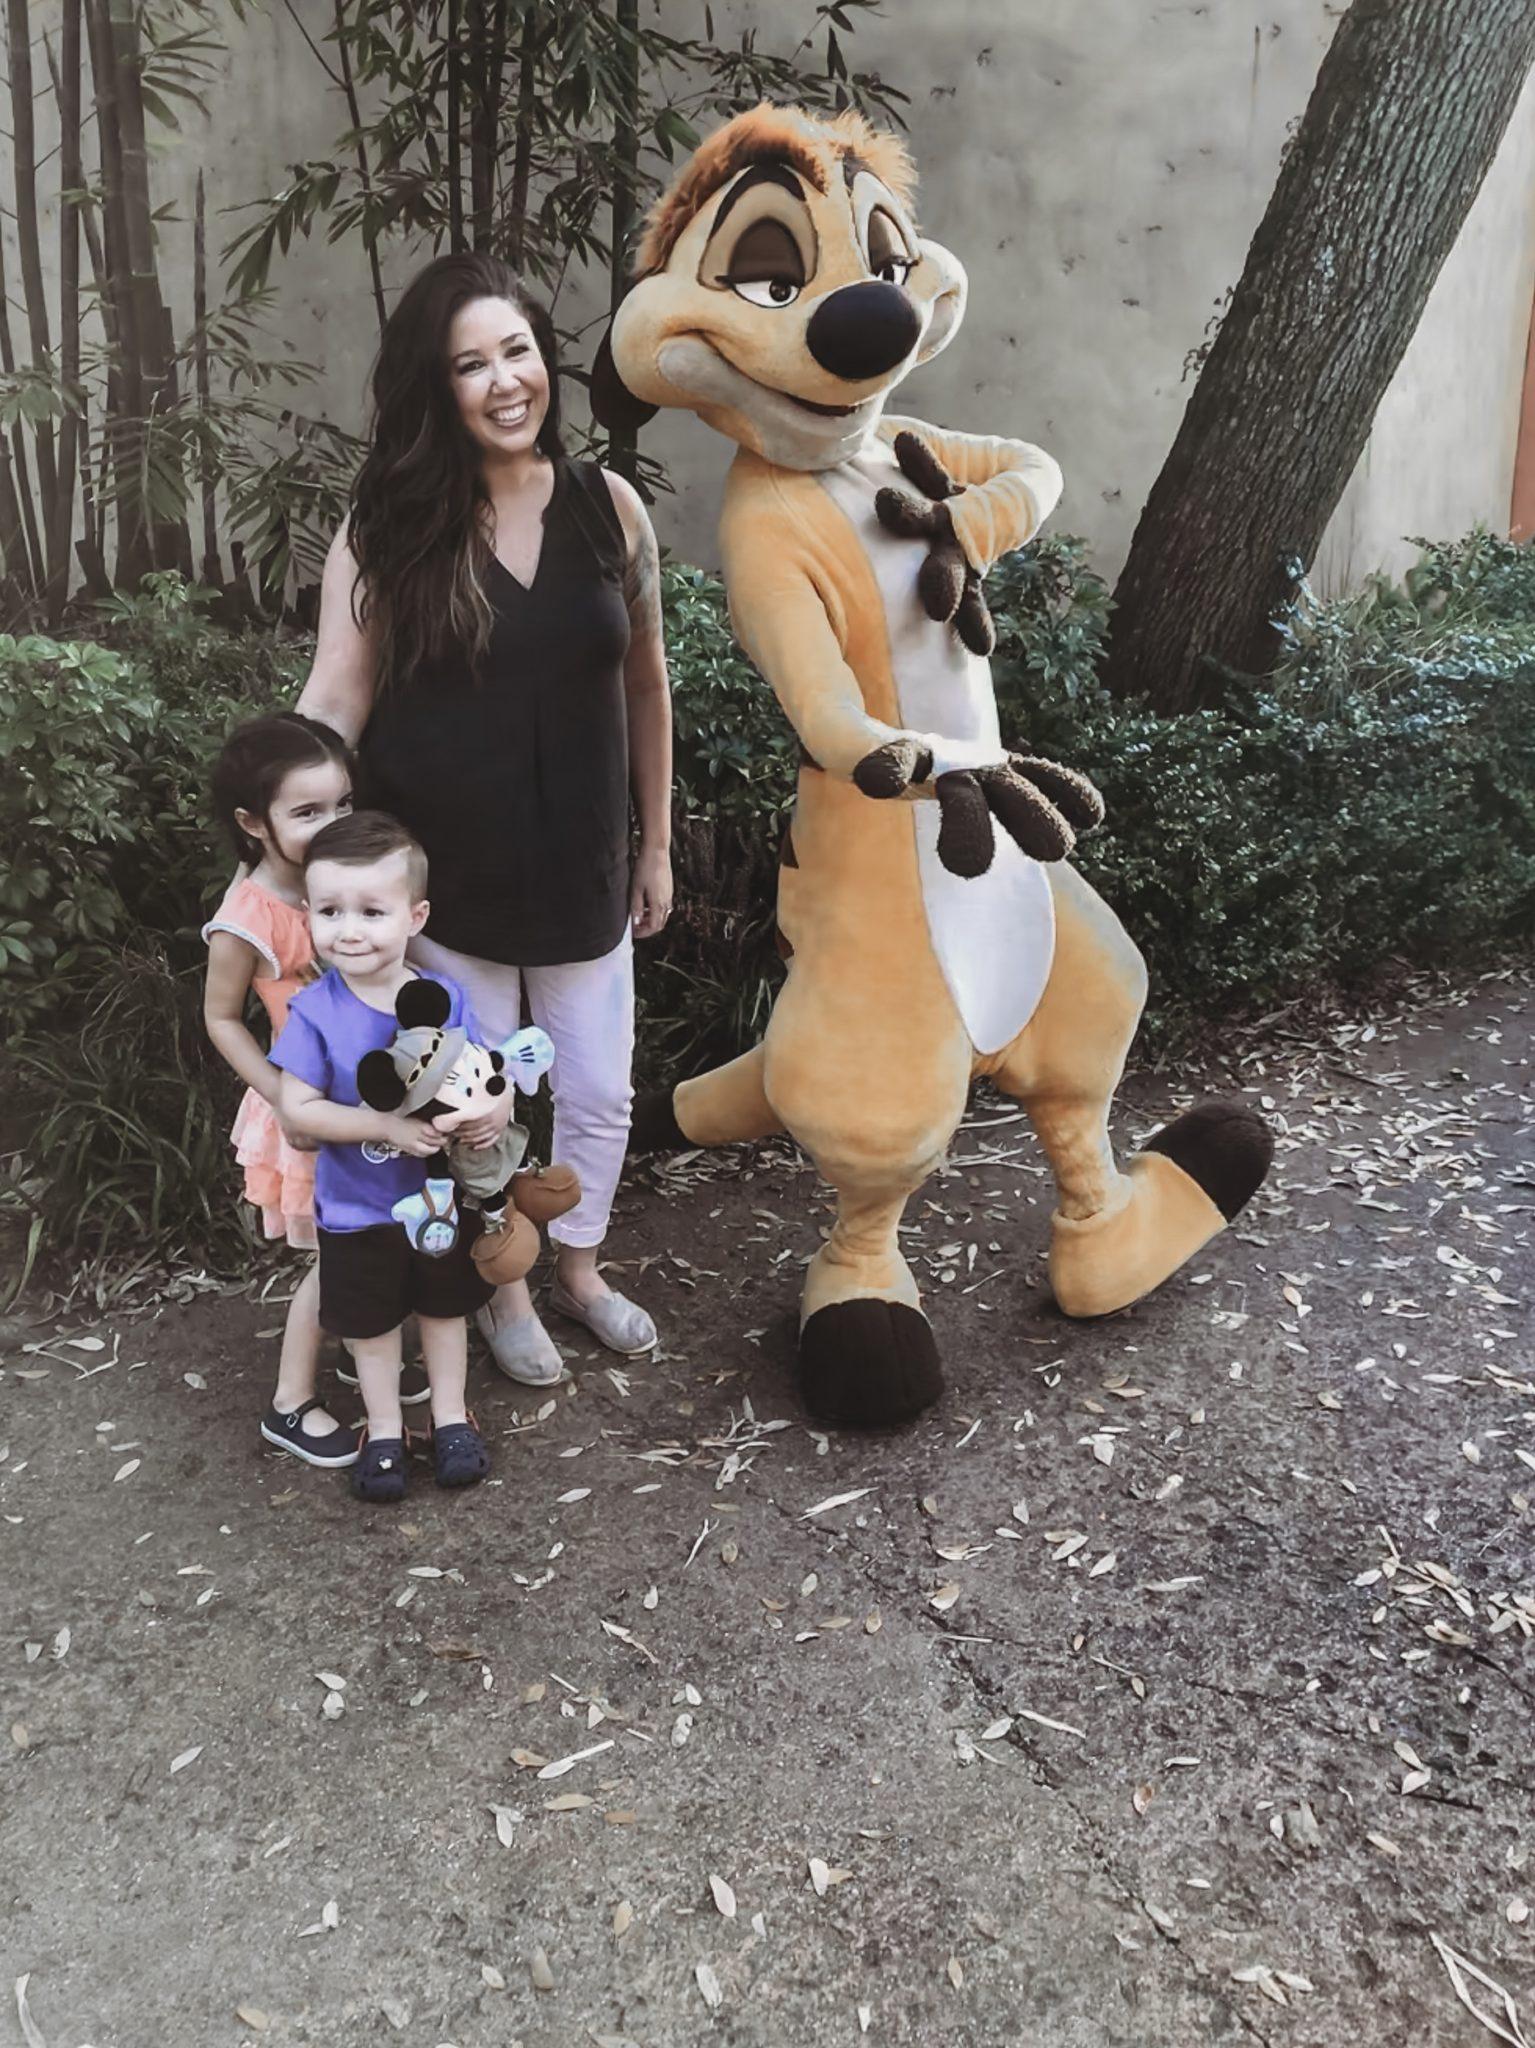 Guide to Animal Kingdom for Toddlers and Preschoolers, Disney's Animal Kingdom Safari